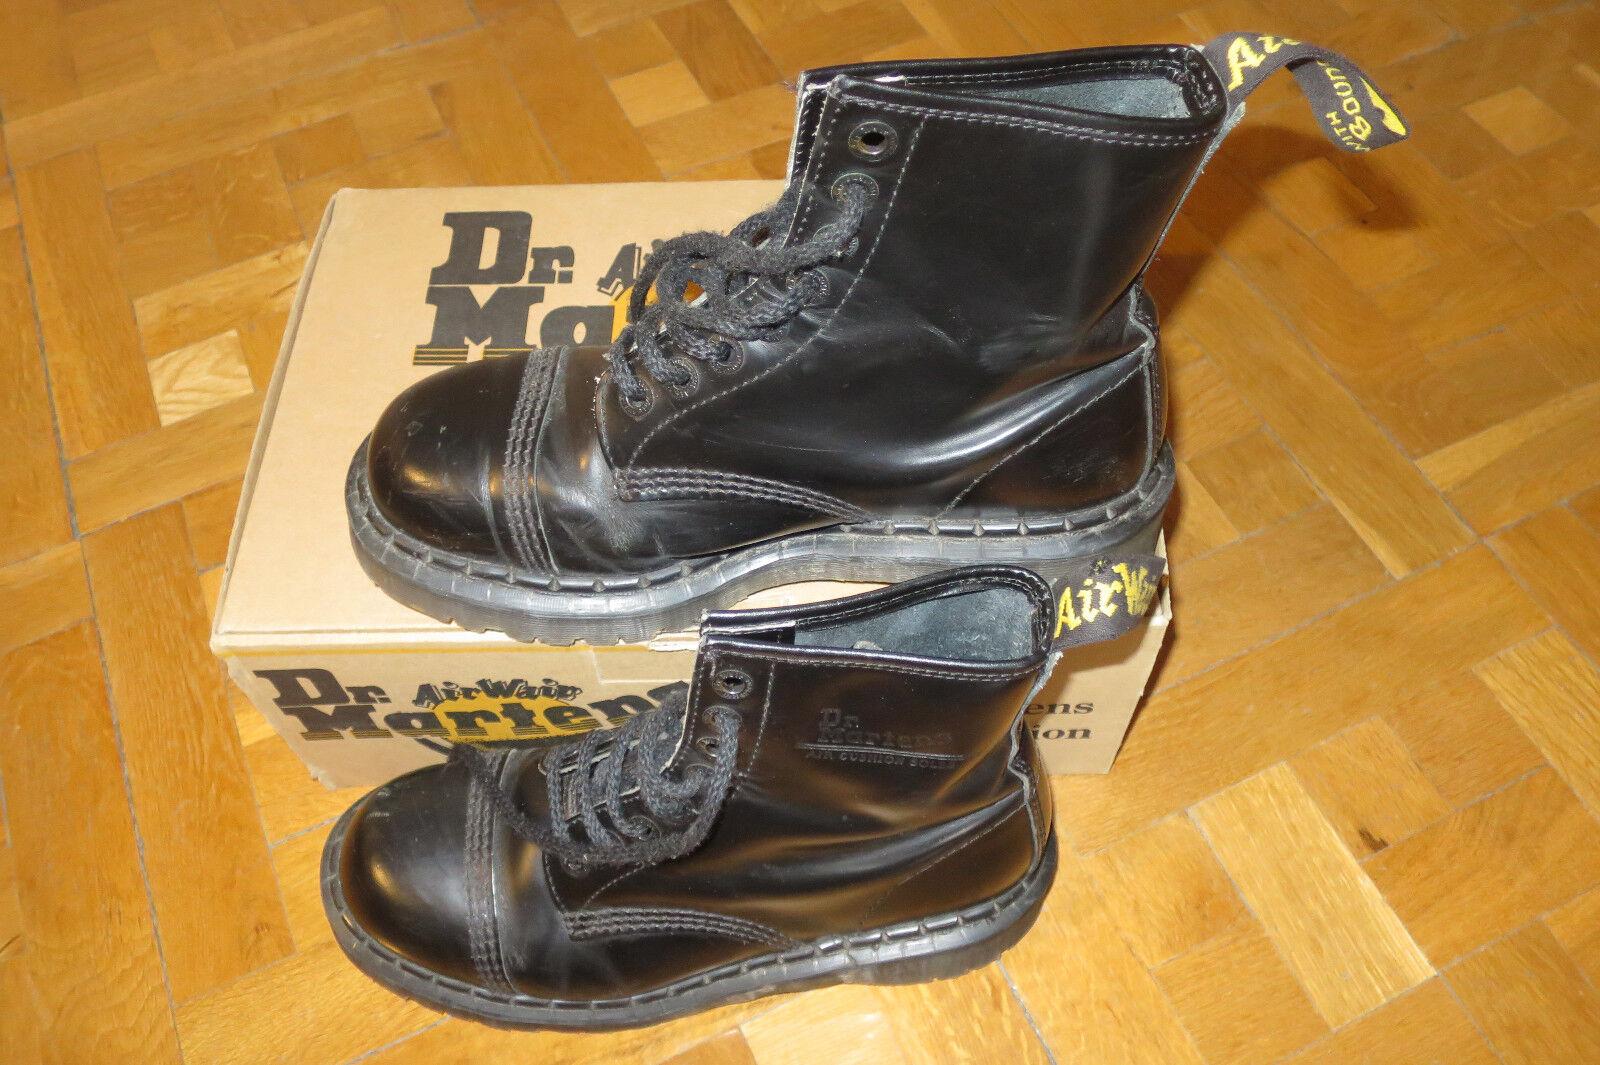 botas negras Dr Martens originales vintage